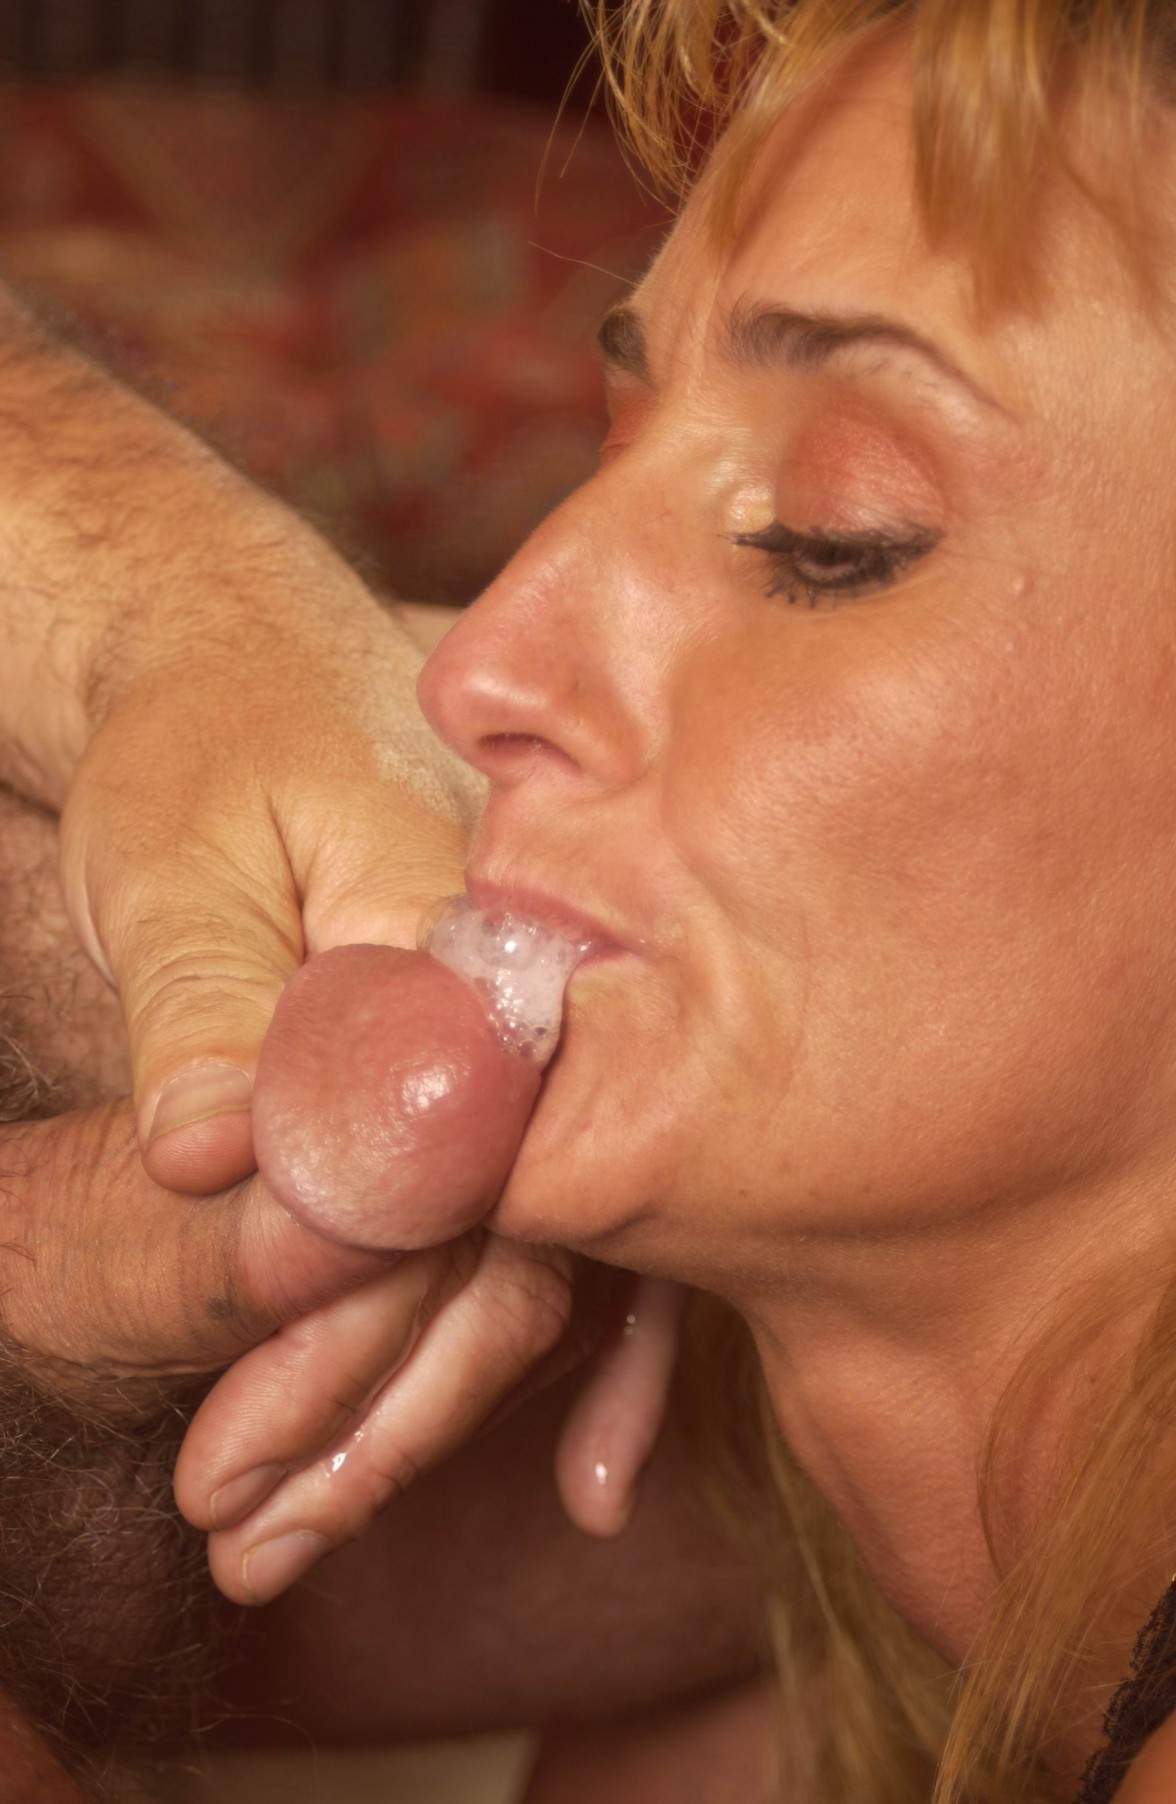 Tothless granny sucking dick for sperm